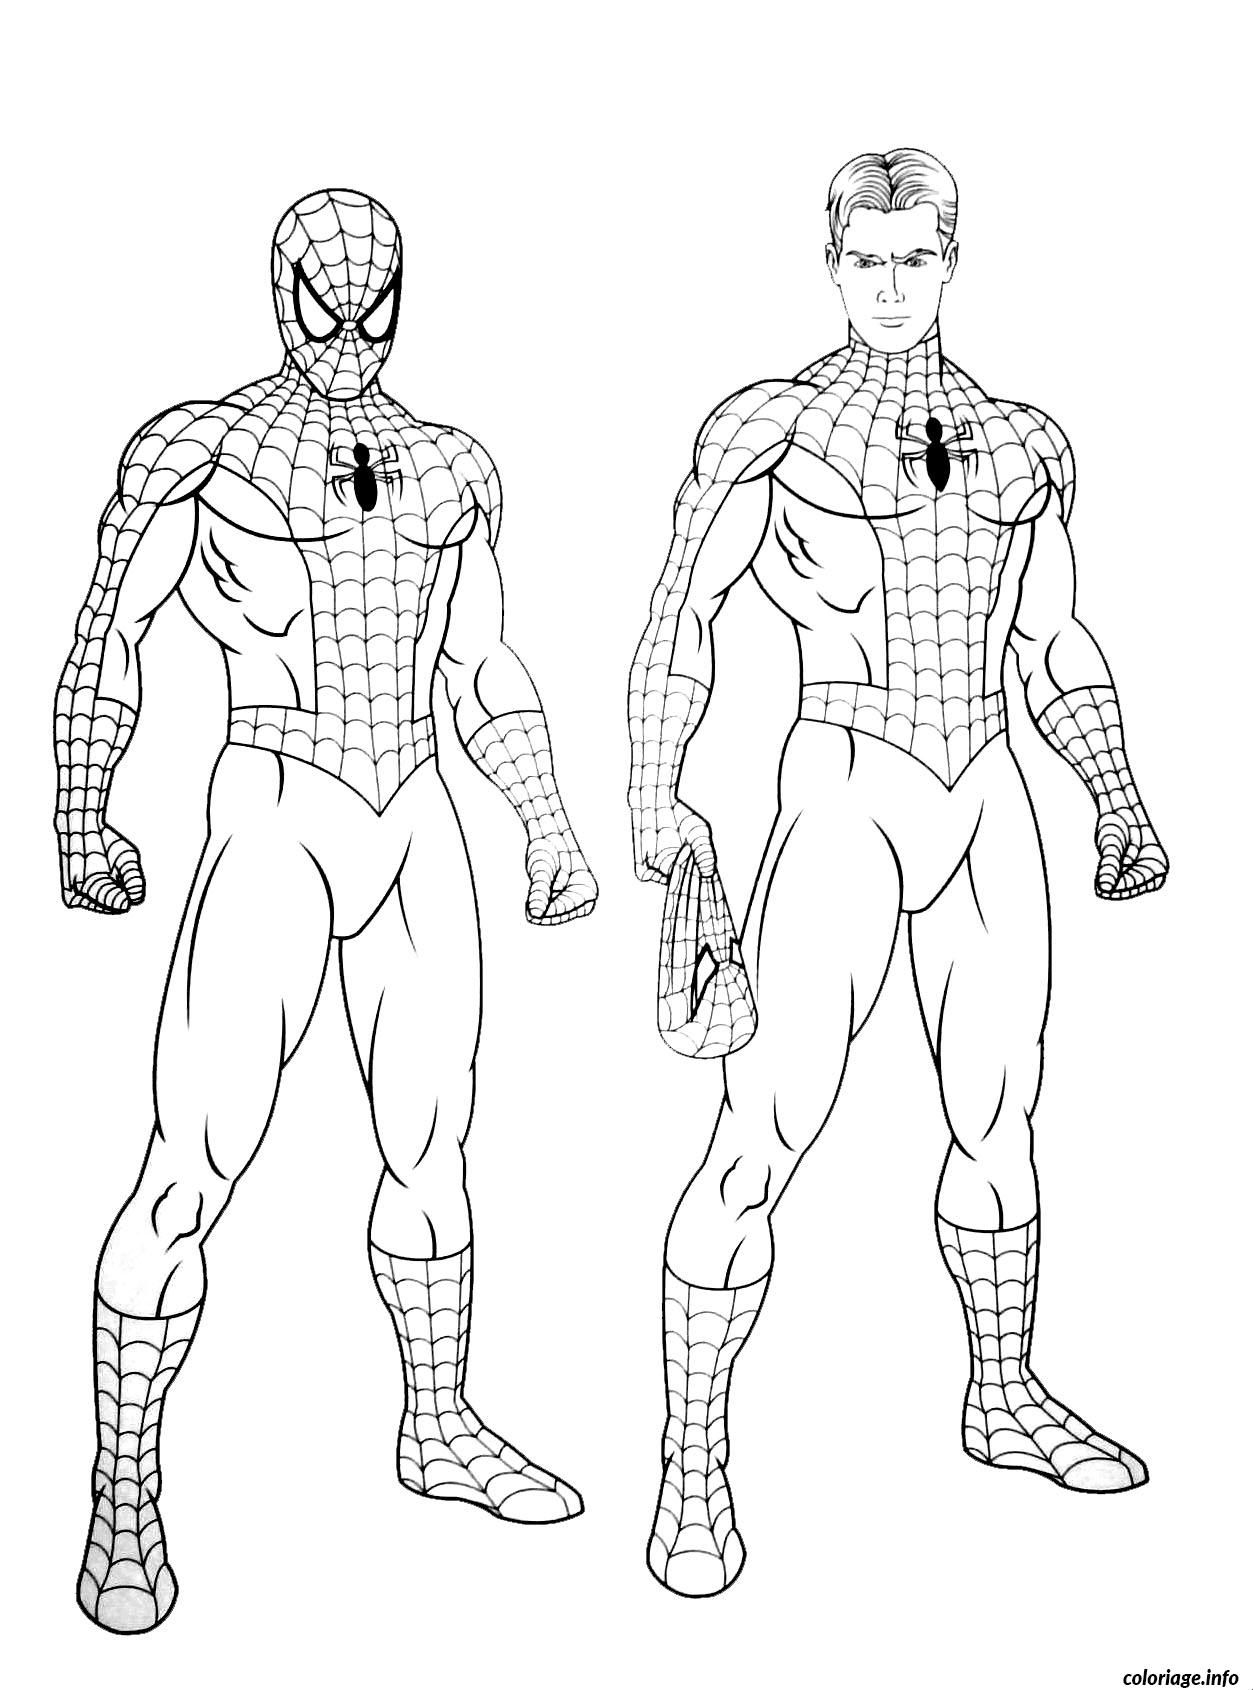 Coloriage Spiderman 224 Dessin Spiderman à imprimer